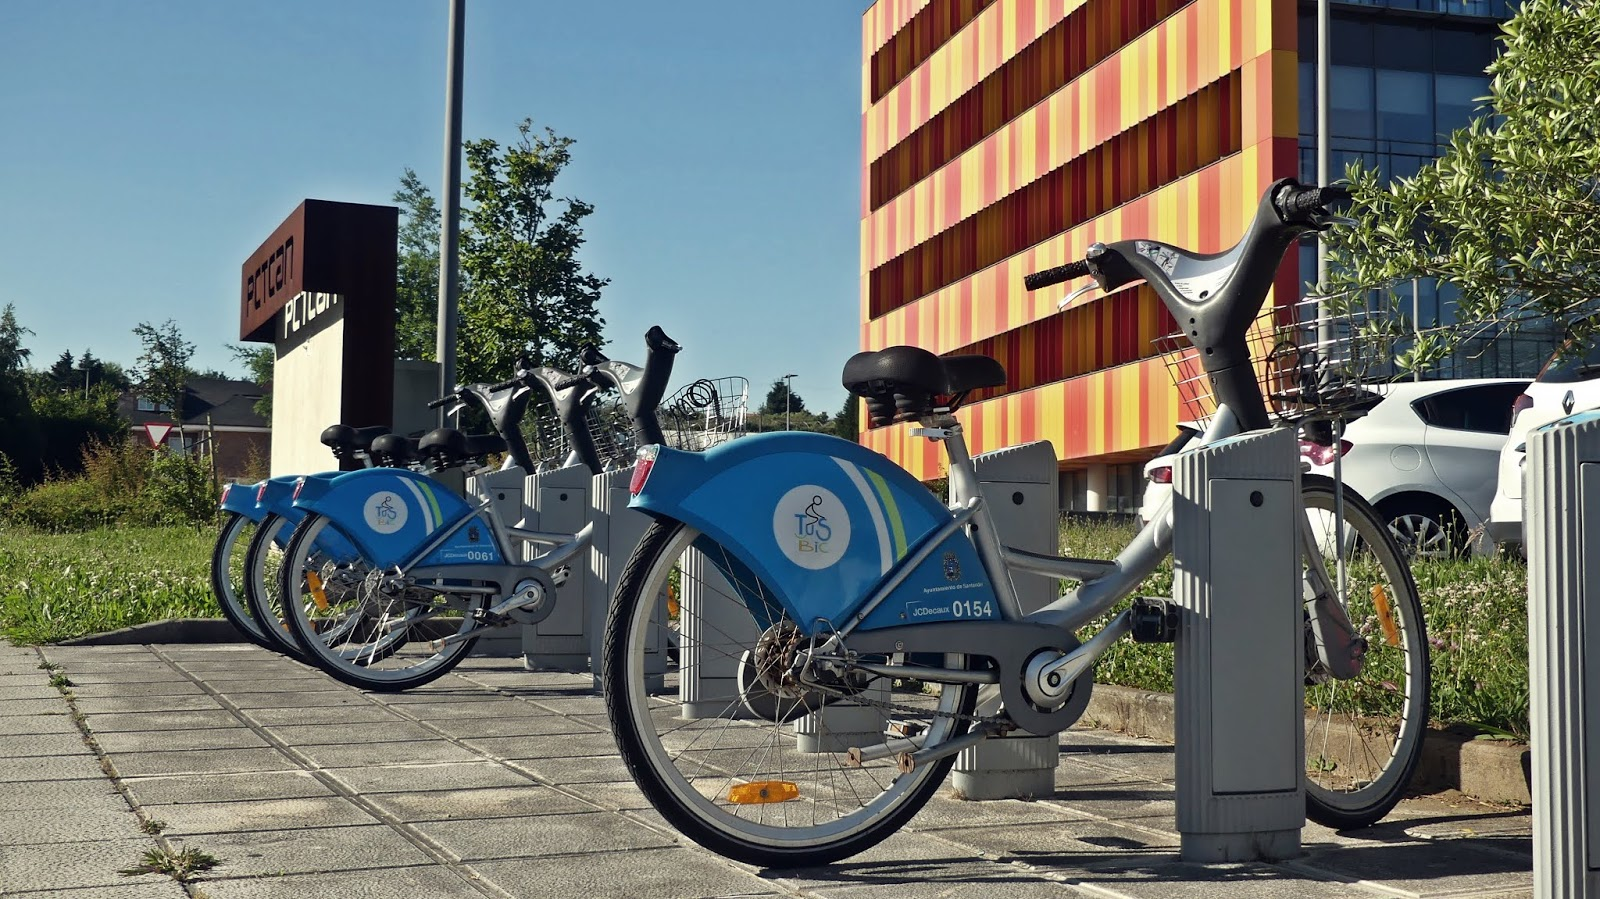 rowery Tus Bic w Santander Hiszpania